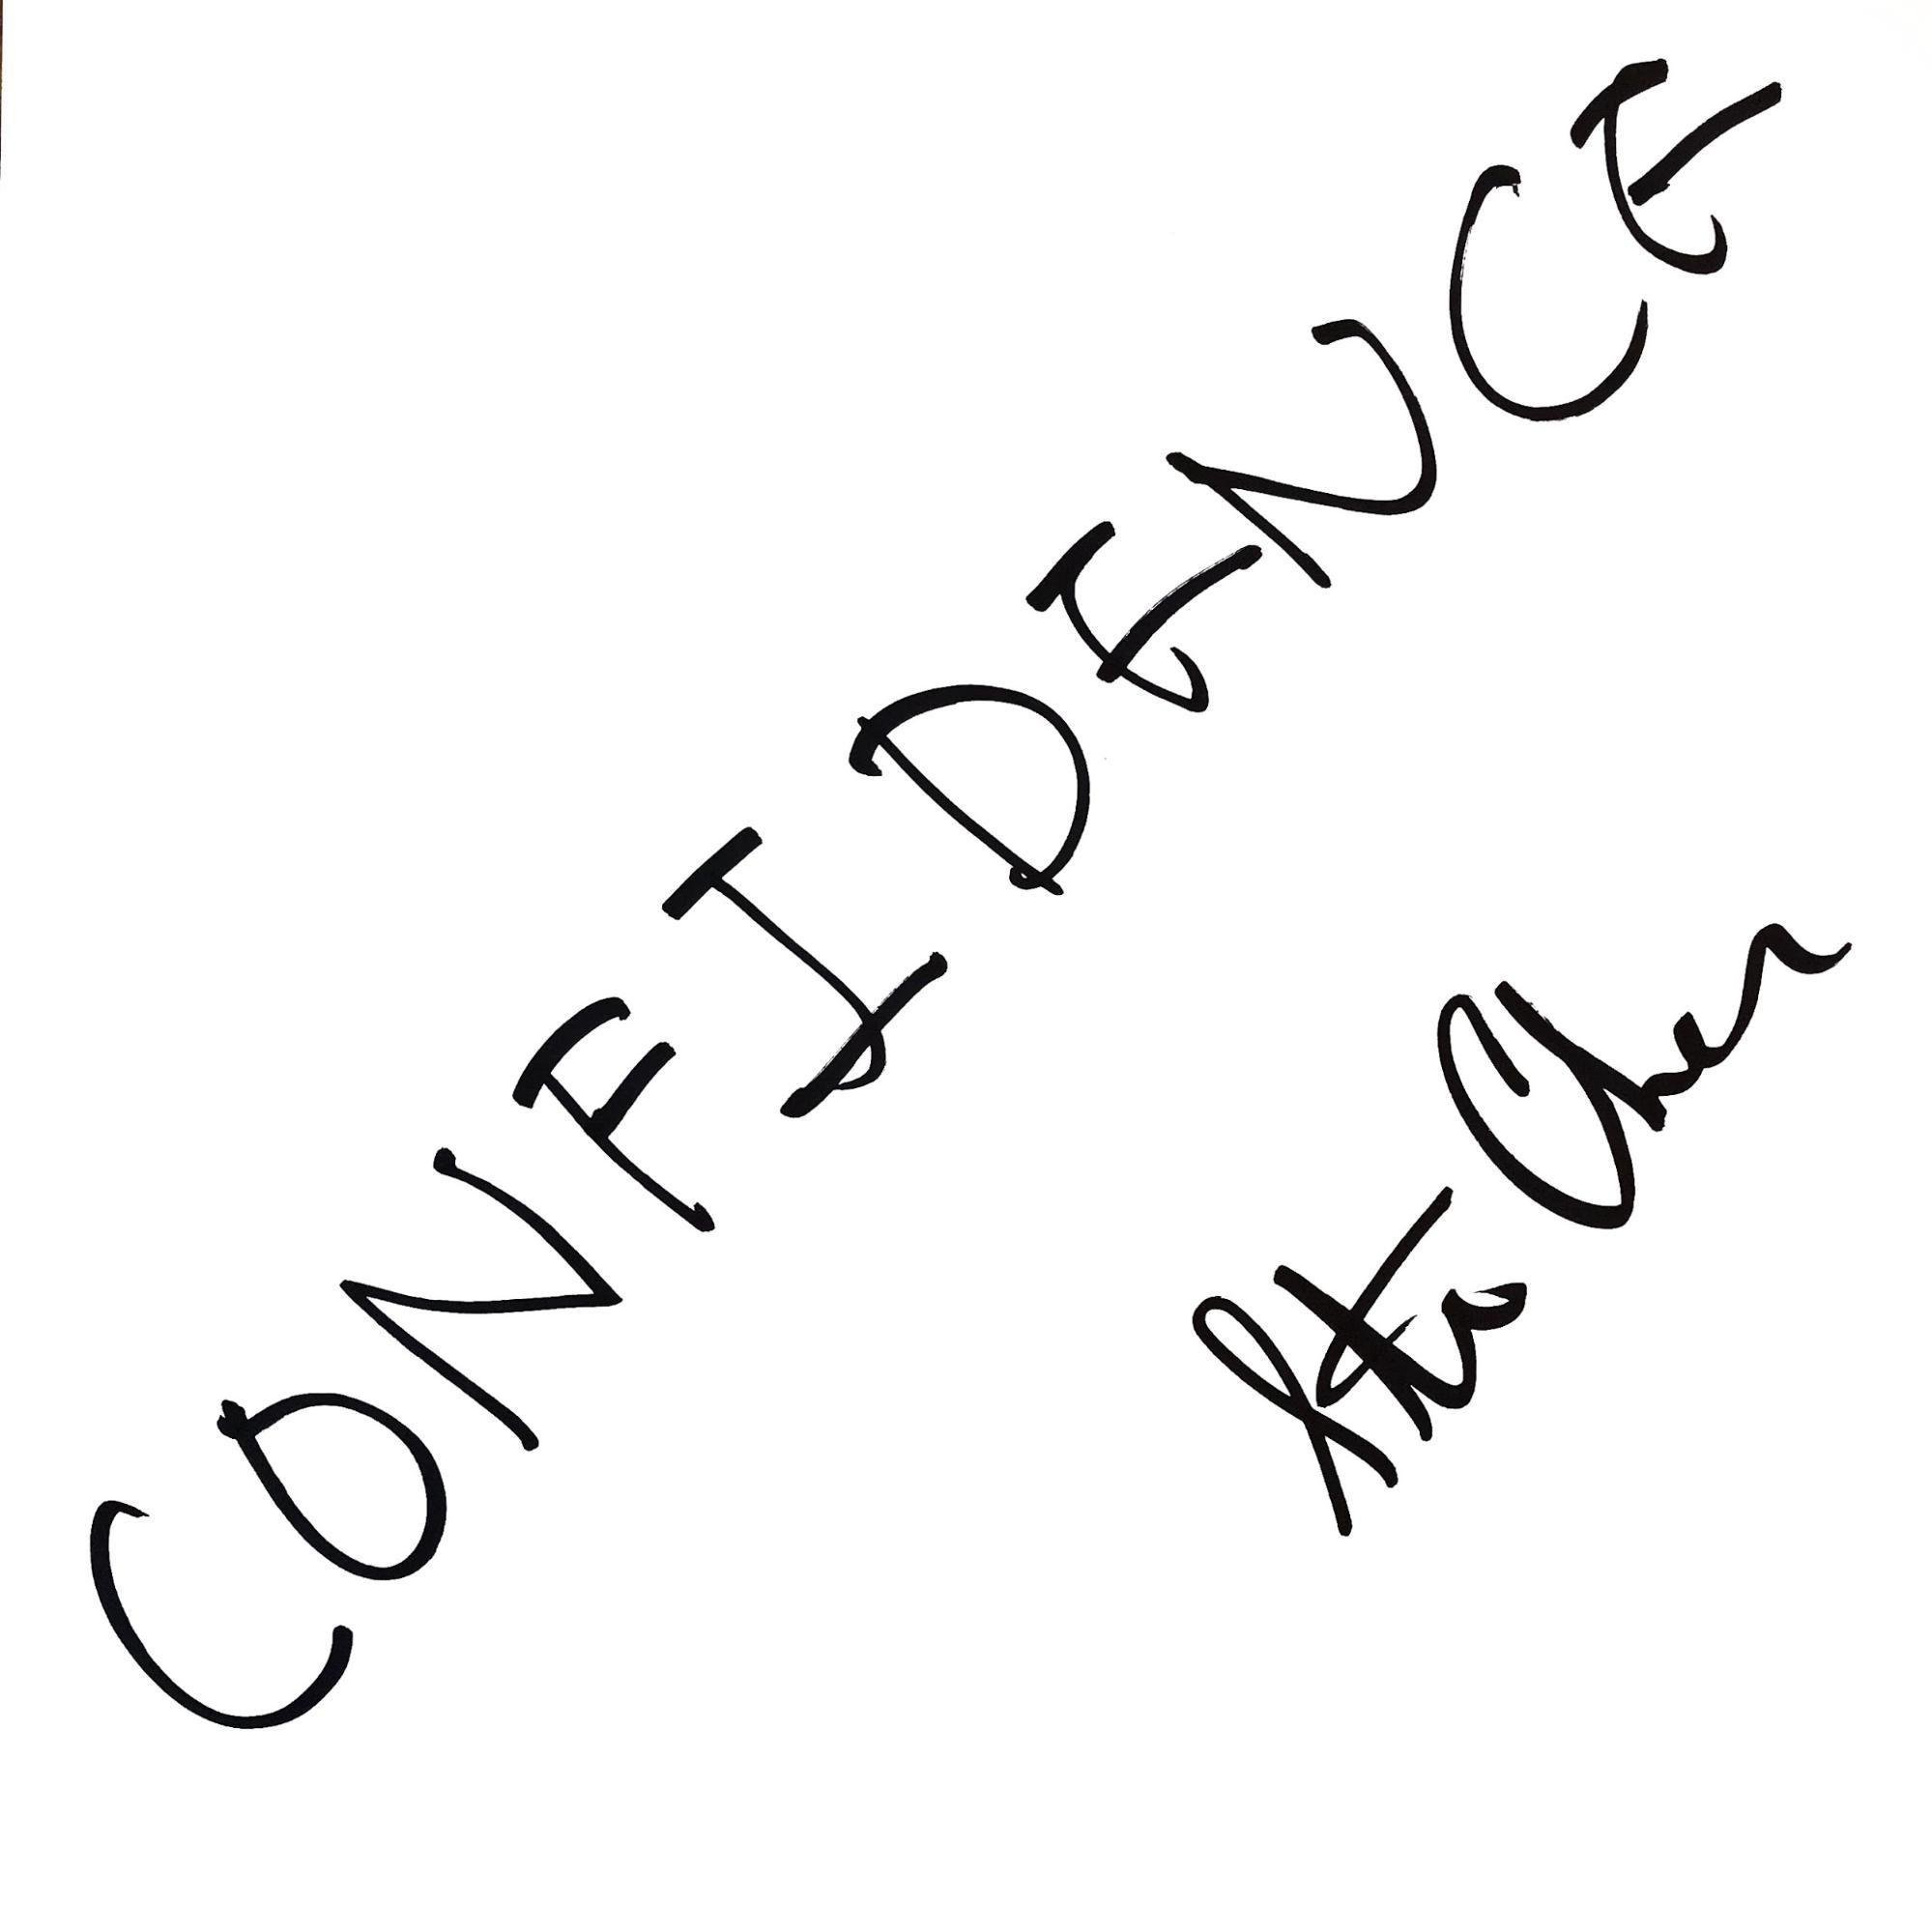 Confidence. Steve Chen